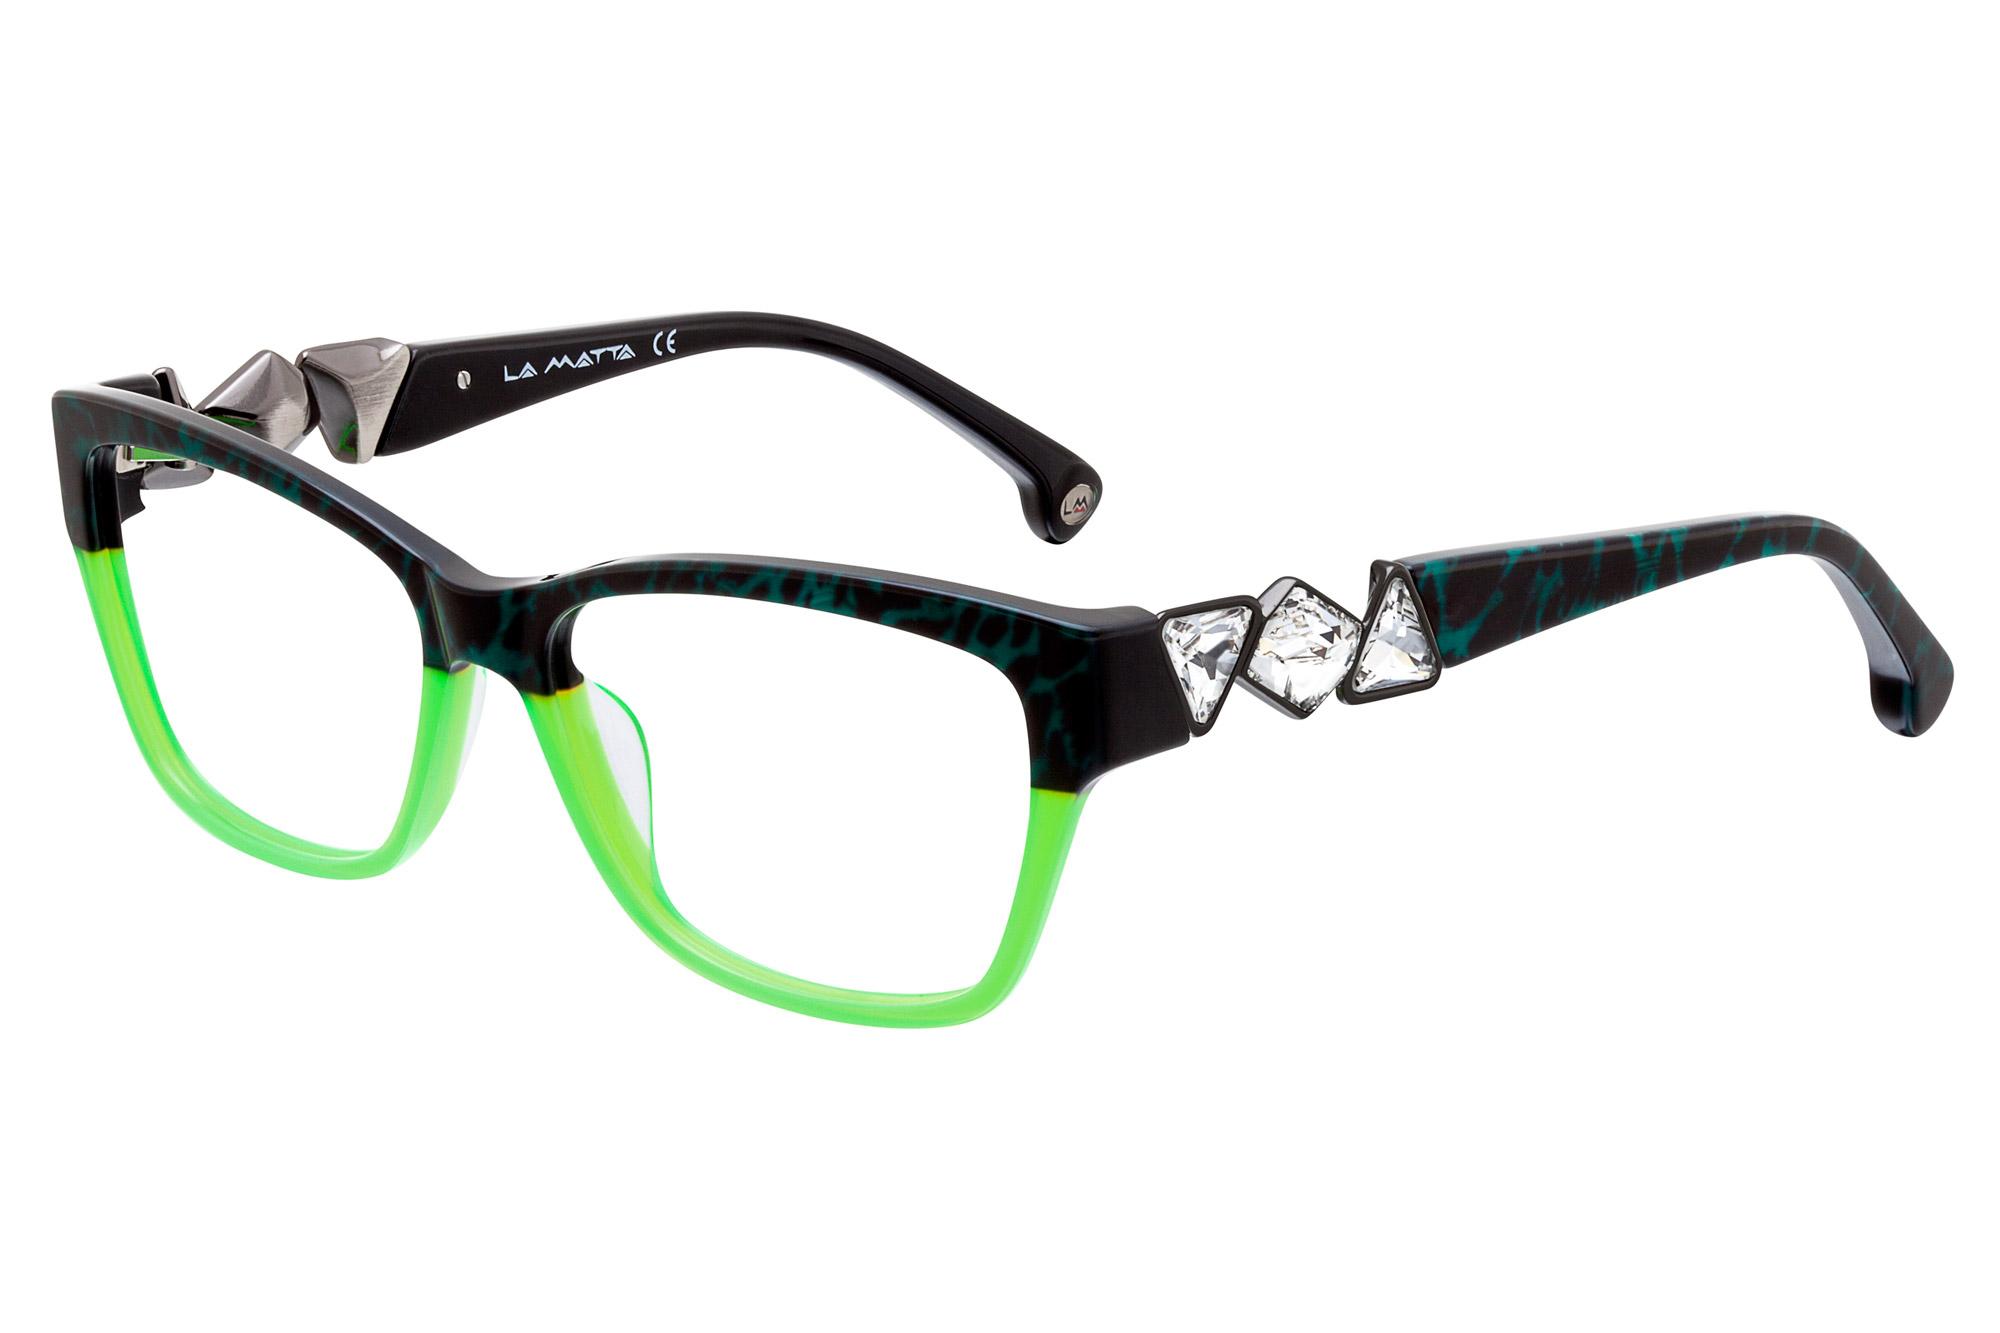 Eyeglass Frames Venice Italy : LA MATTA LMV-3182 VENEZIA ORO OCCHIALI Venice Eyewear ...